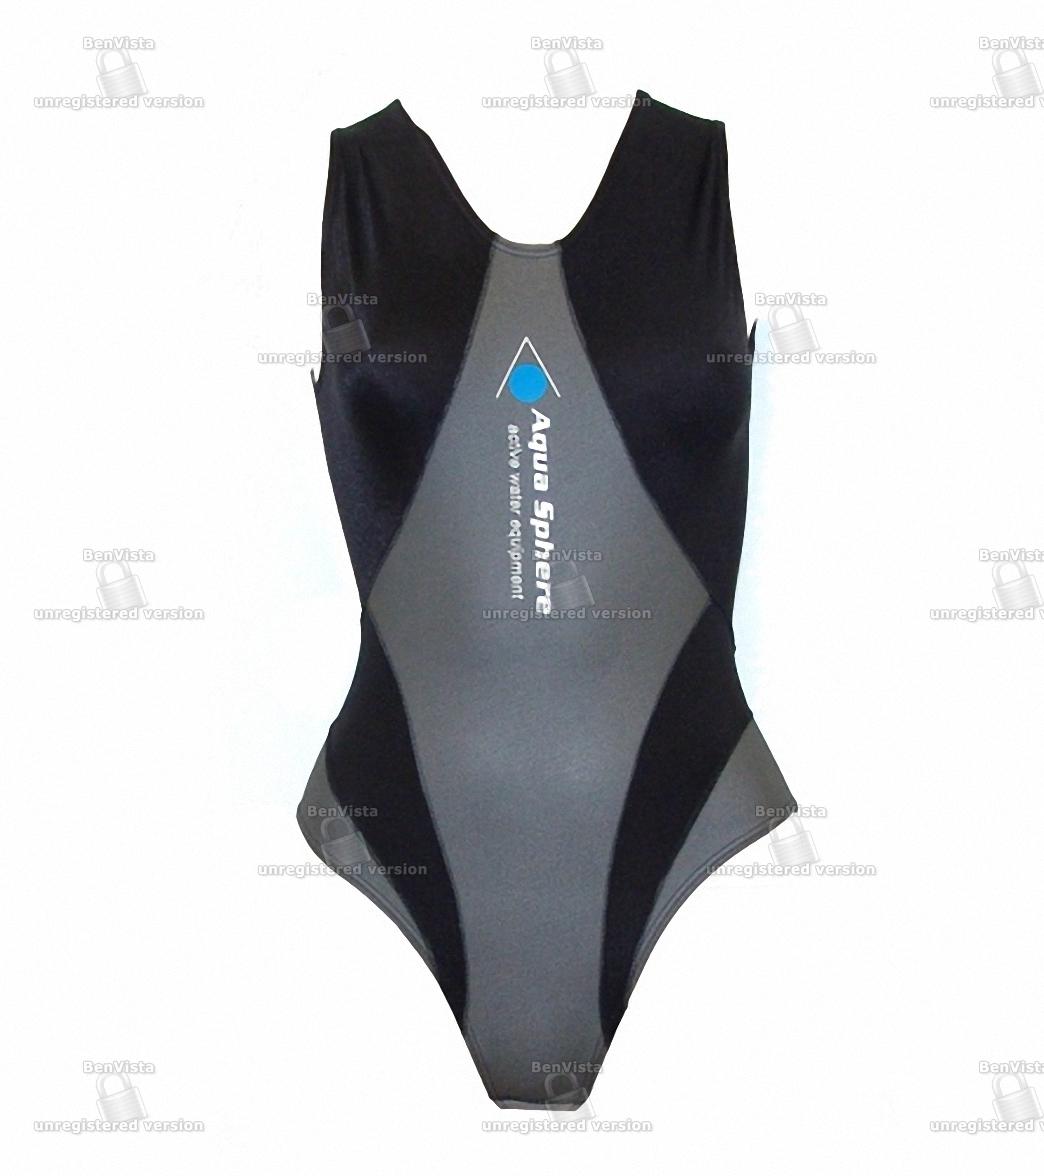 966150b6488 Aqua Sphere Ladies WT-80 Swim Skin at SwimOutlet.com - Free ...